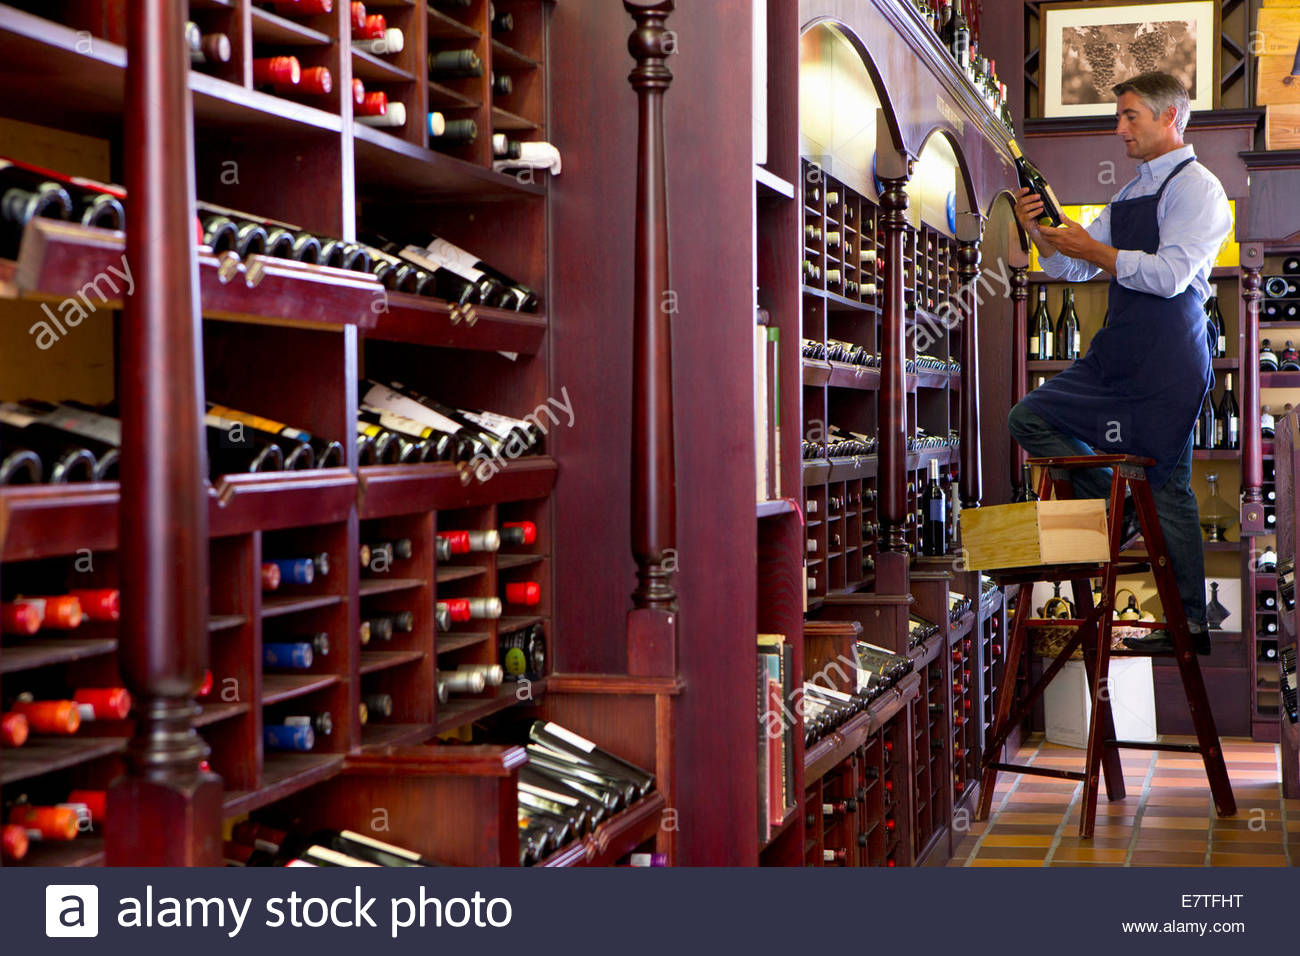 Worker on ladder stocking bottles in wine shop - Stock Image